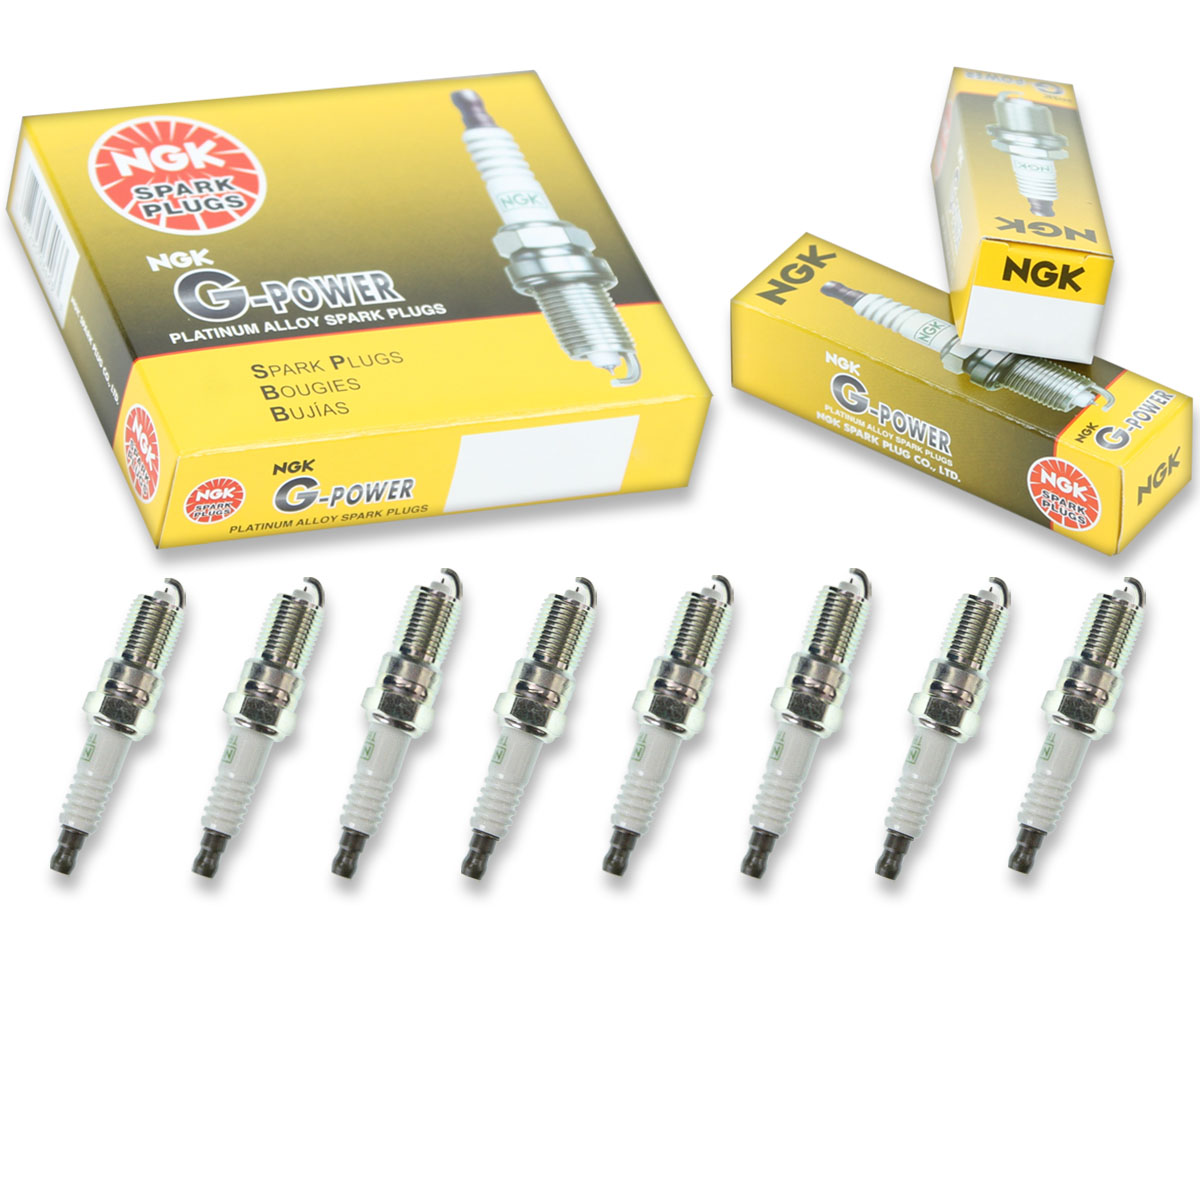 8 pcs NGK V-Power Spark Plugs for 1998-2014 Chevrolet Express 1500 5.7L 5.3L vv